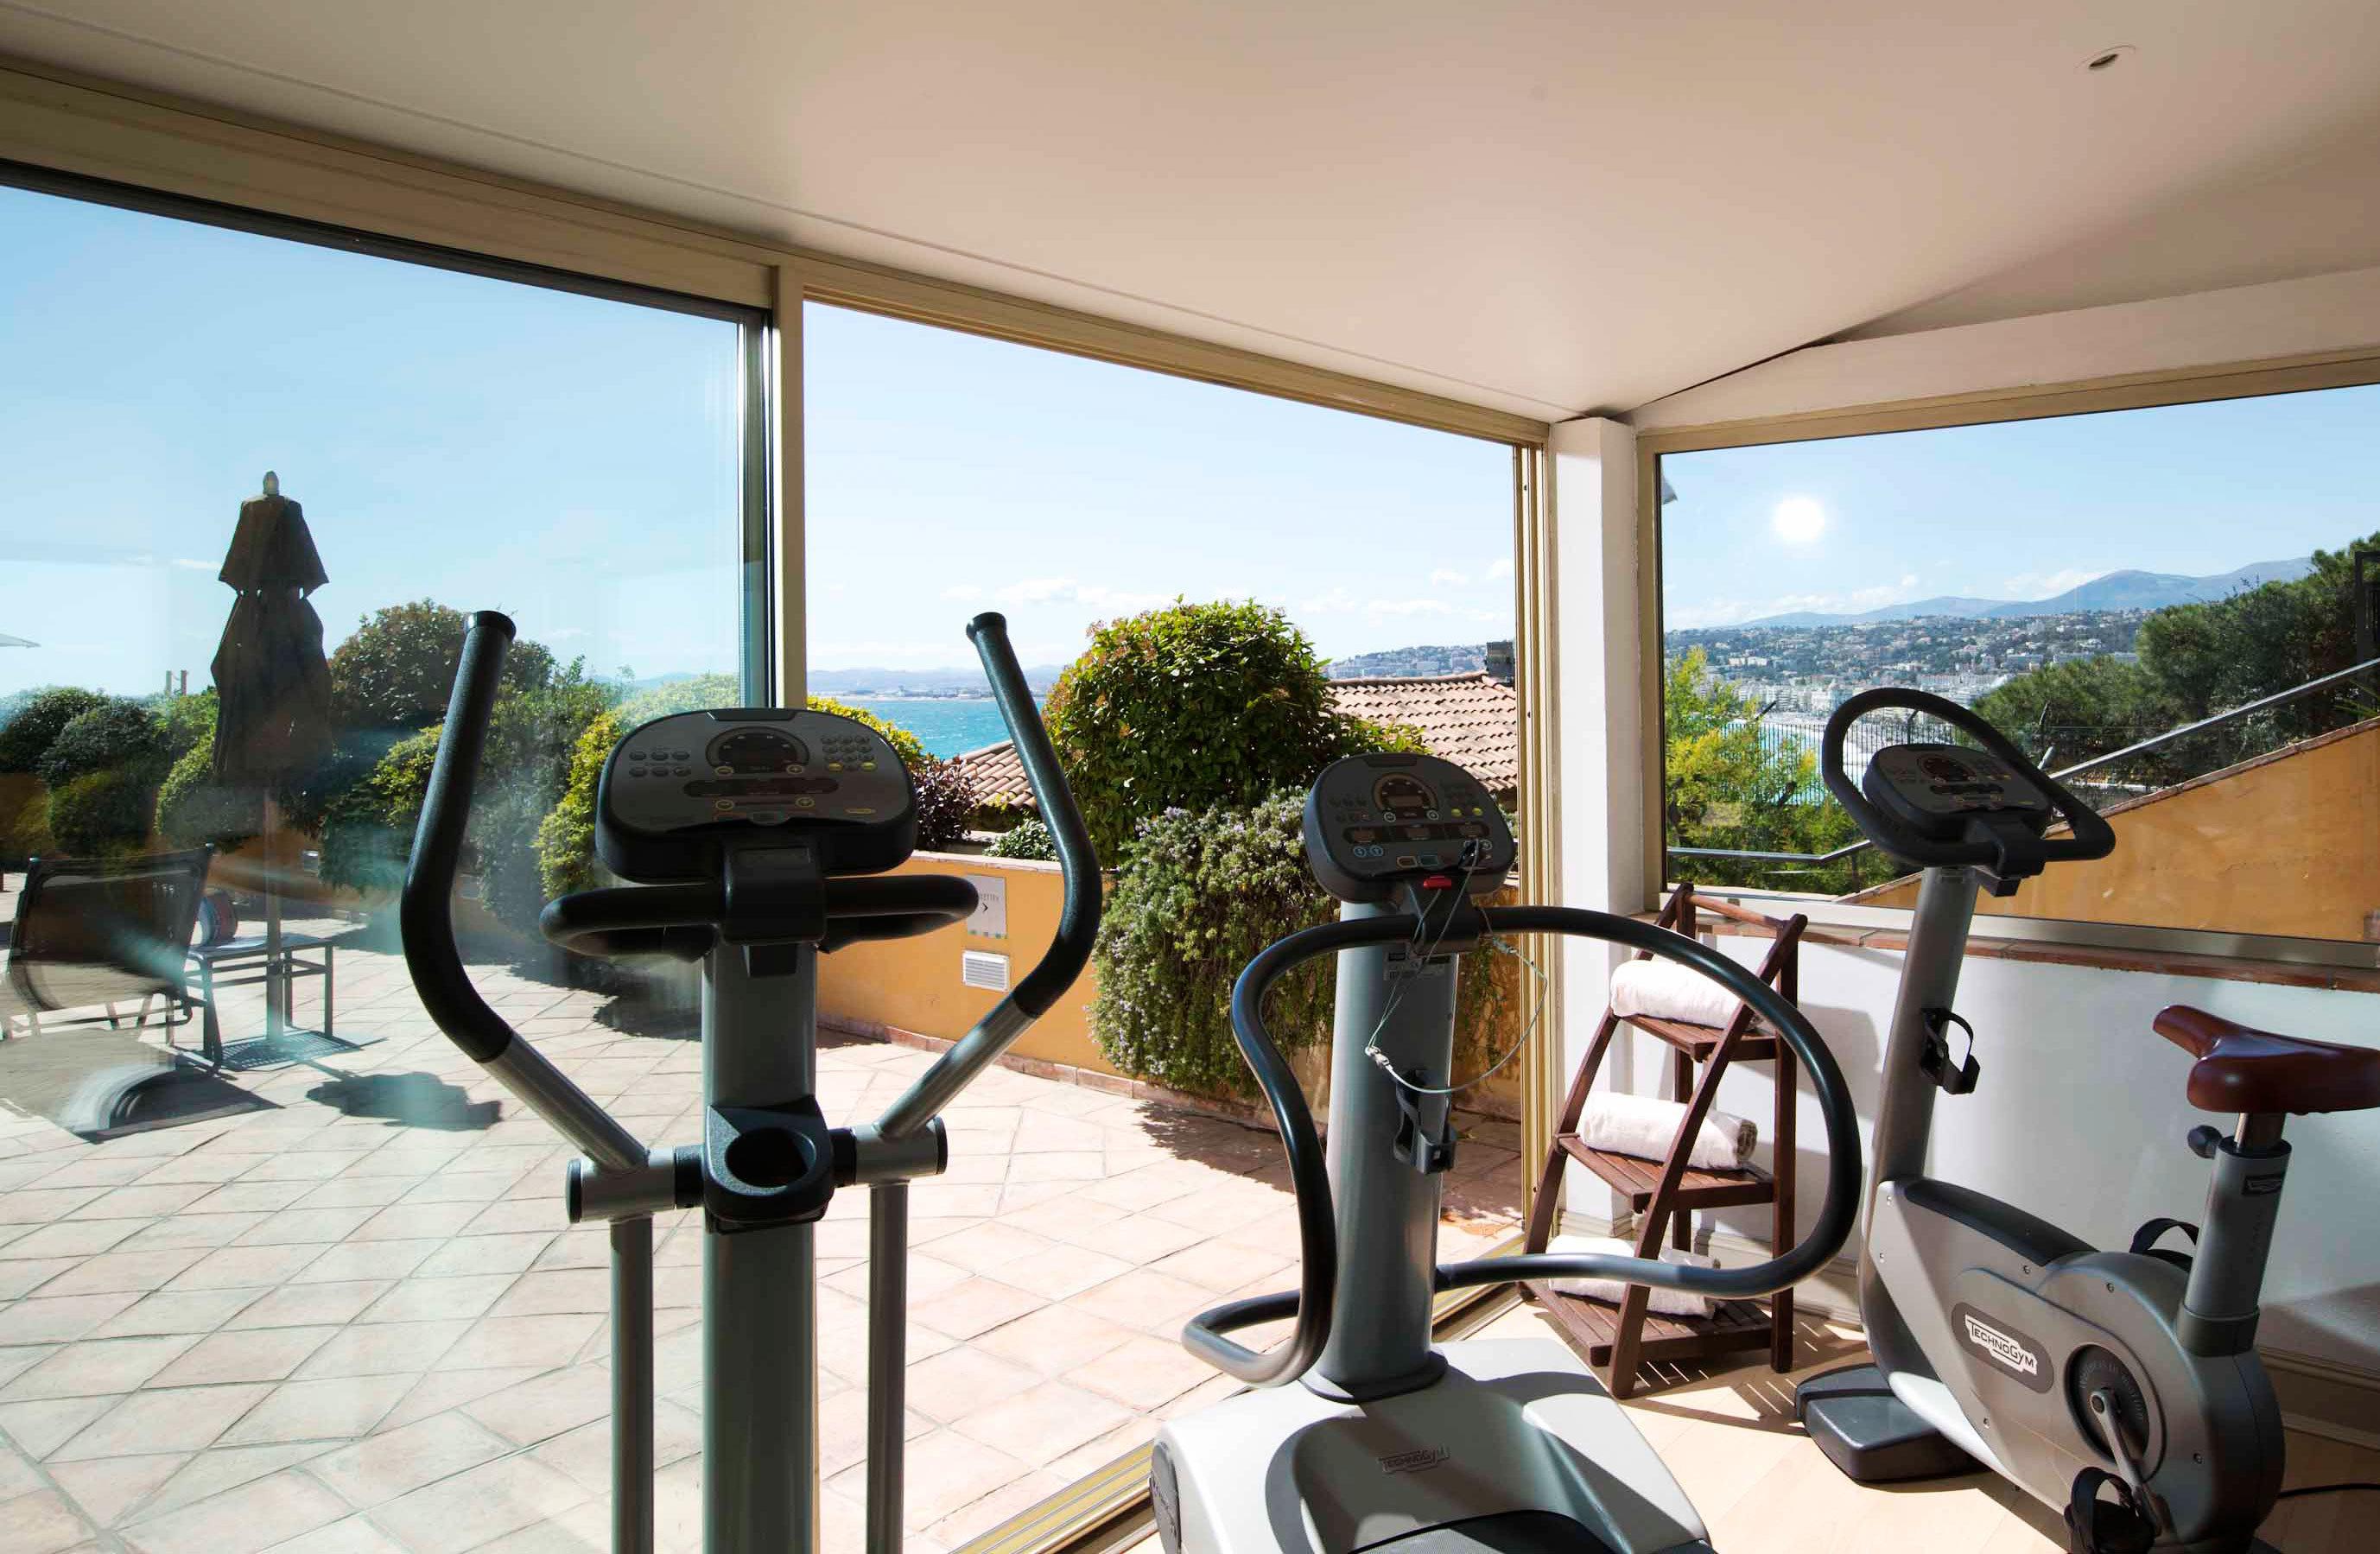 property condominium home Villa cottage mansion Resort